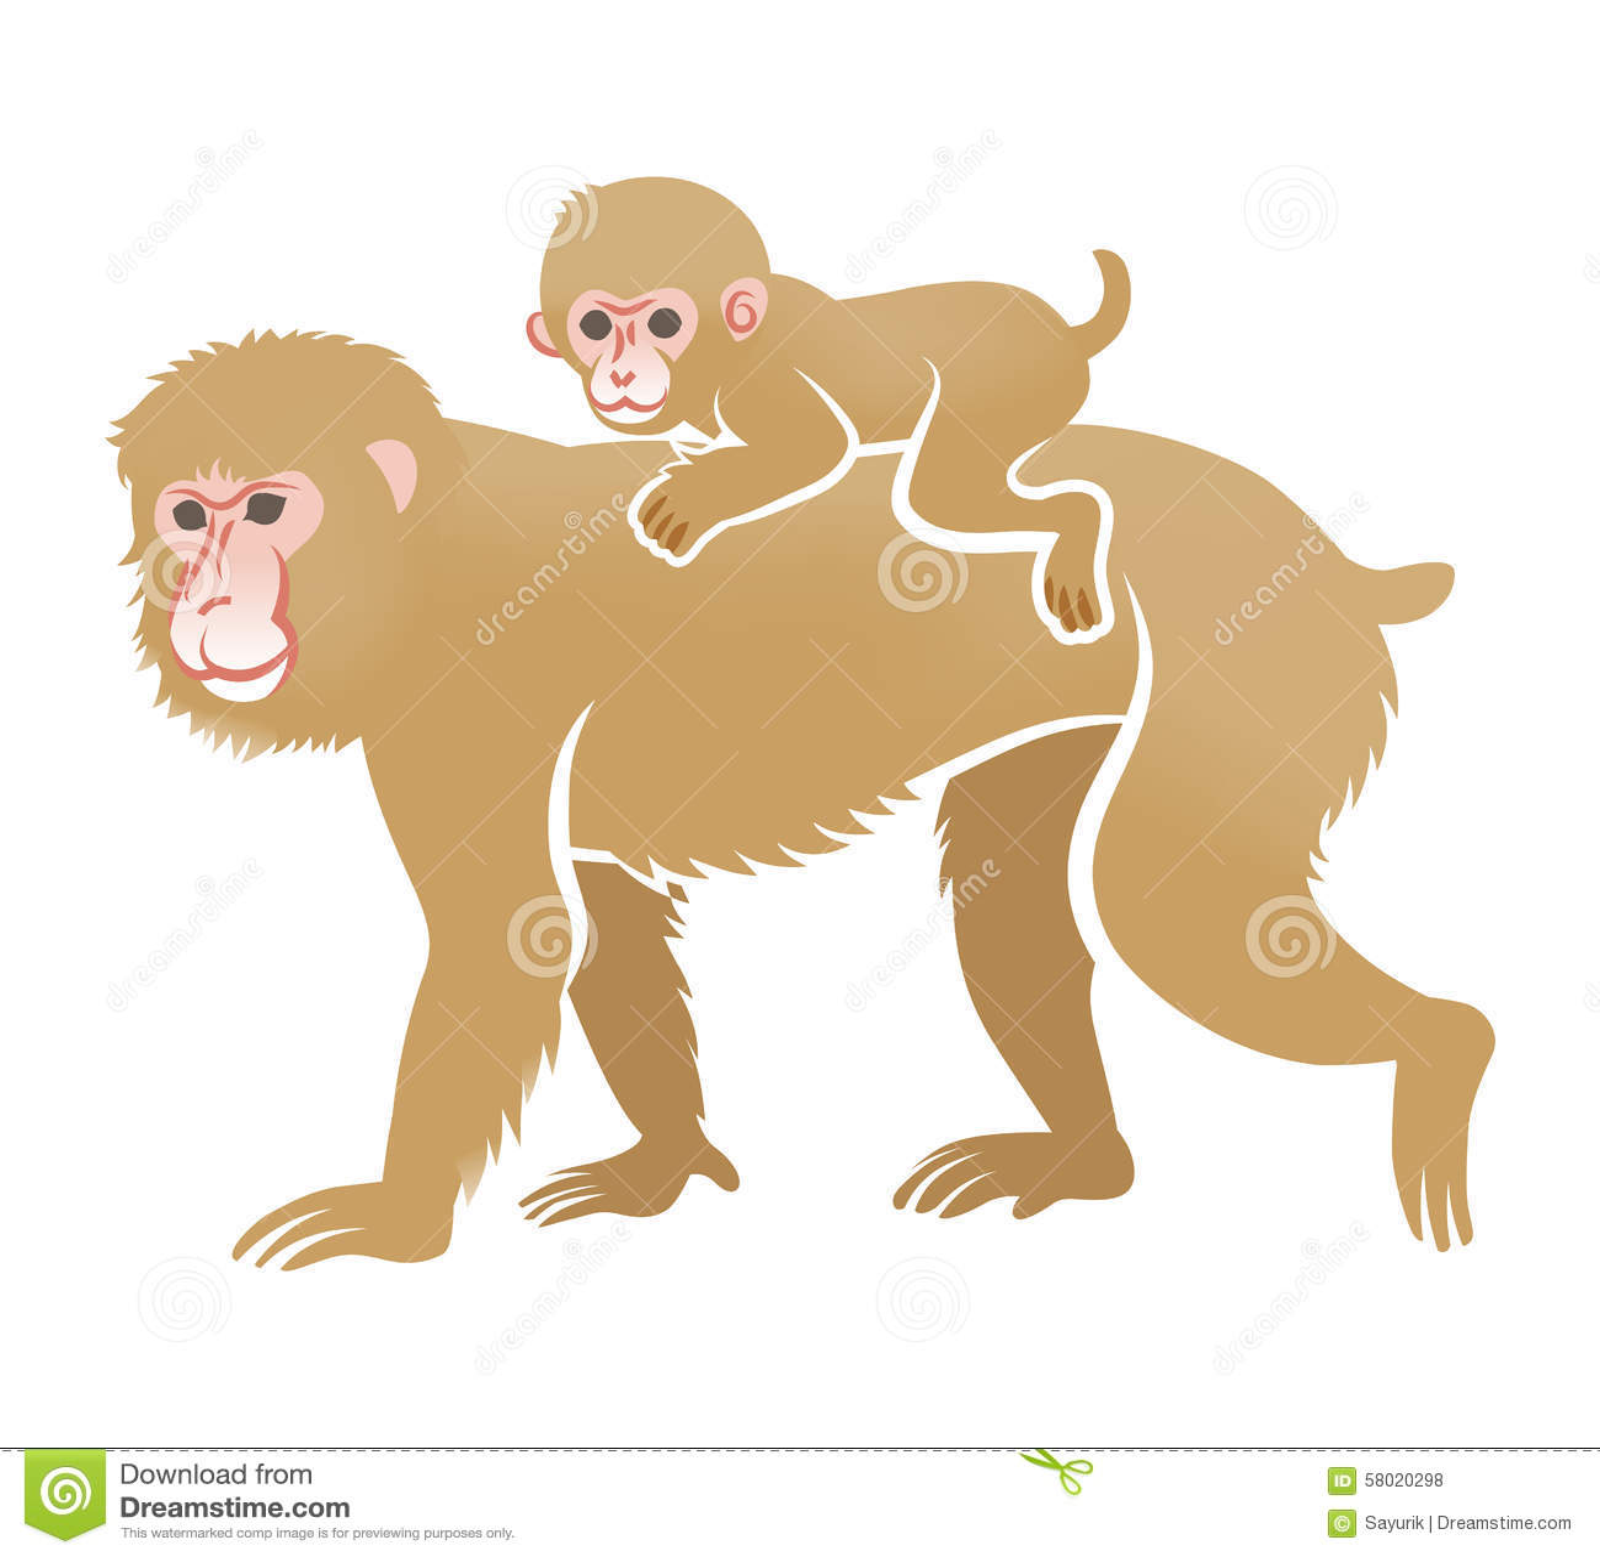 joy ride monkey and pig stock vector illustration of animals rh dreamstime com Monkey Border Clip Art Doctor Clip Art